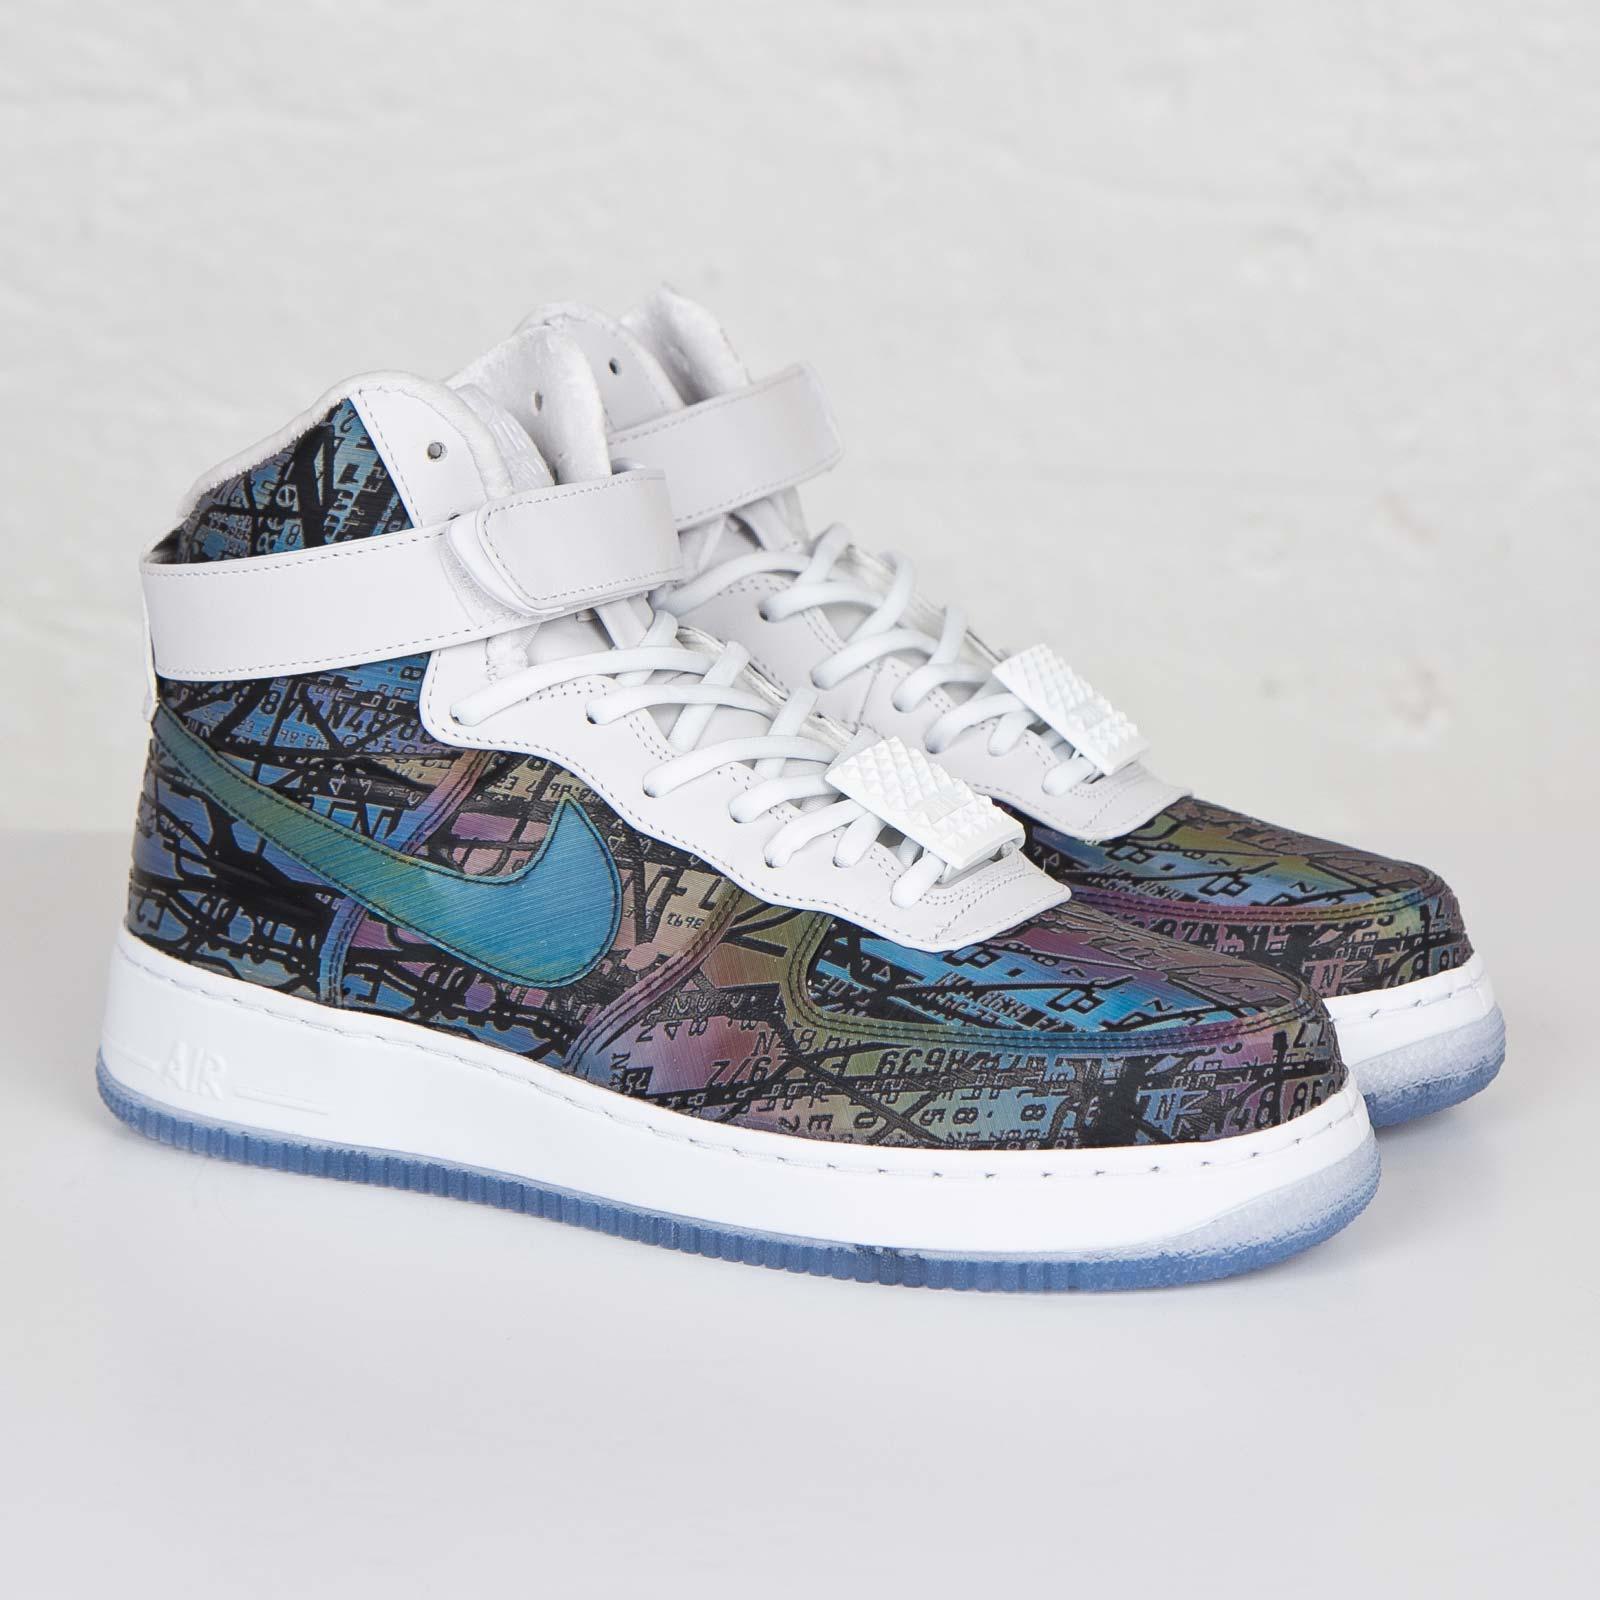 b831c04d80051 Nike Air Force 1 Hi Cmft LW Premium QS - 812981-900 - Sneakersnstuff ...